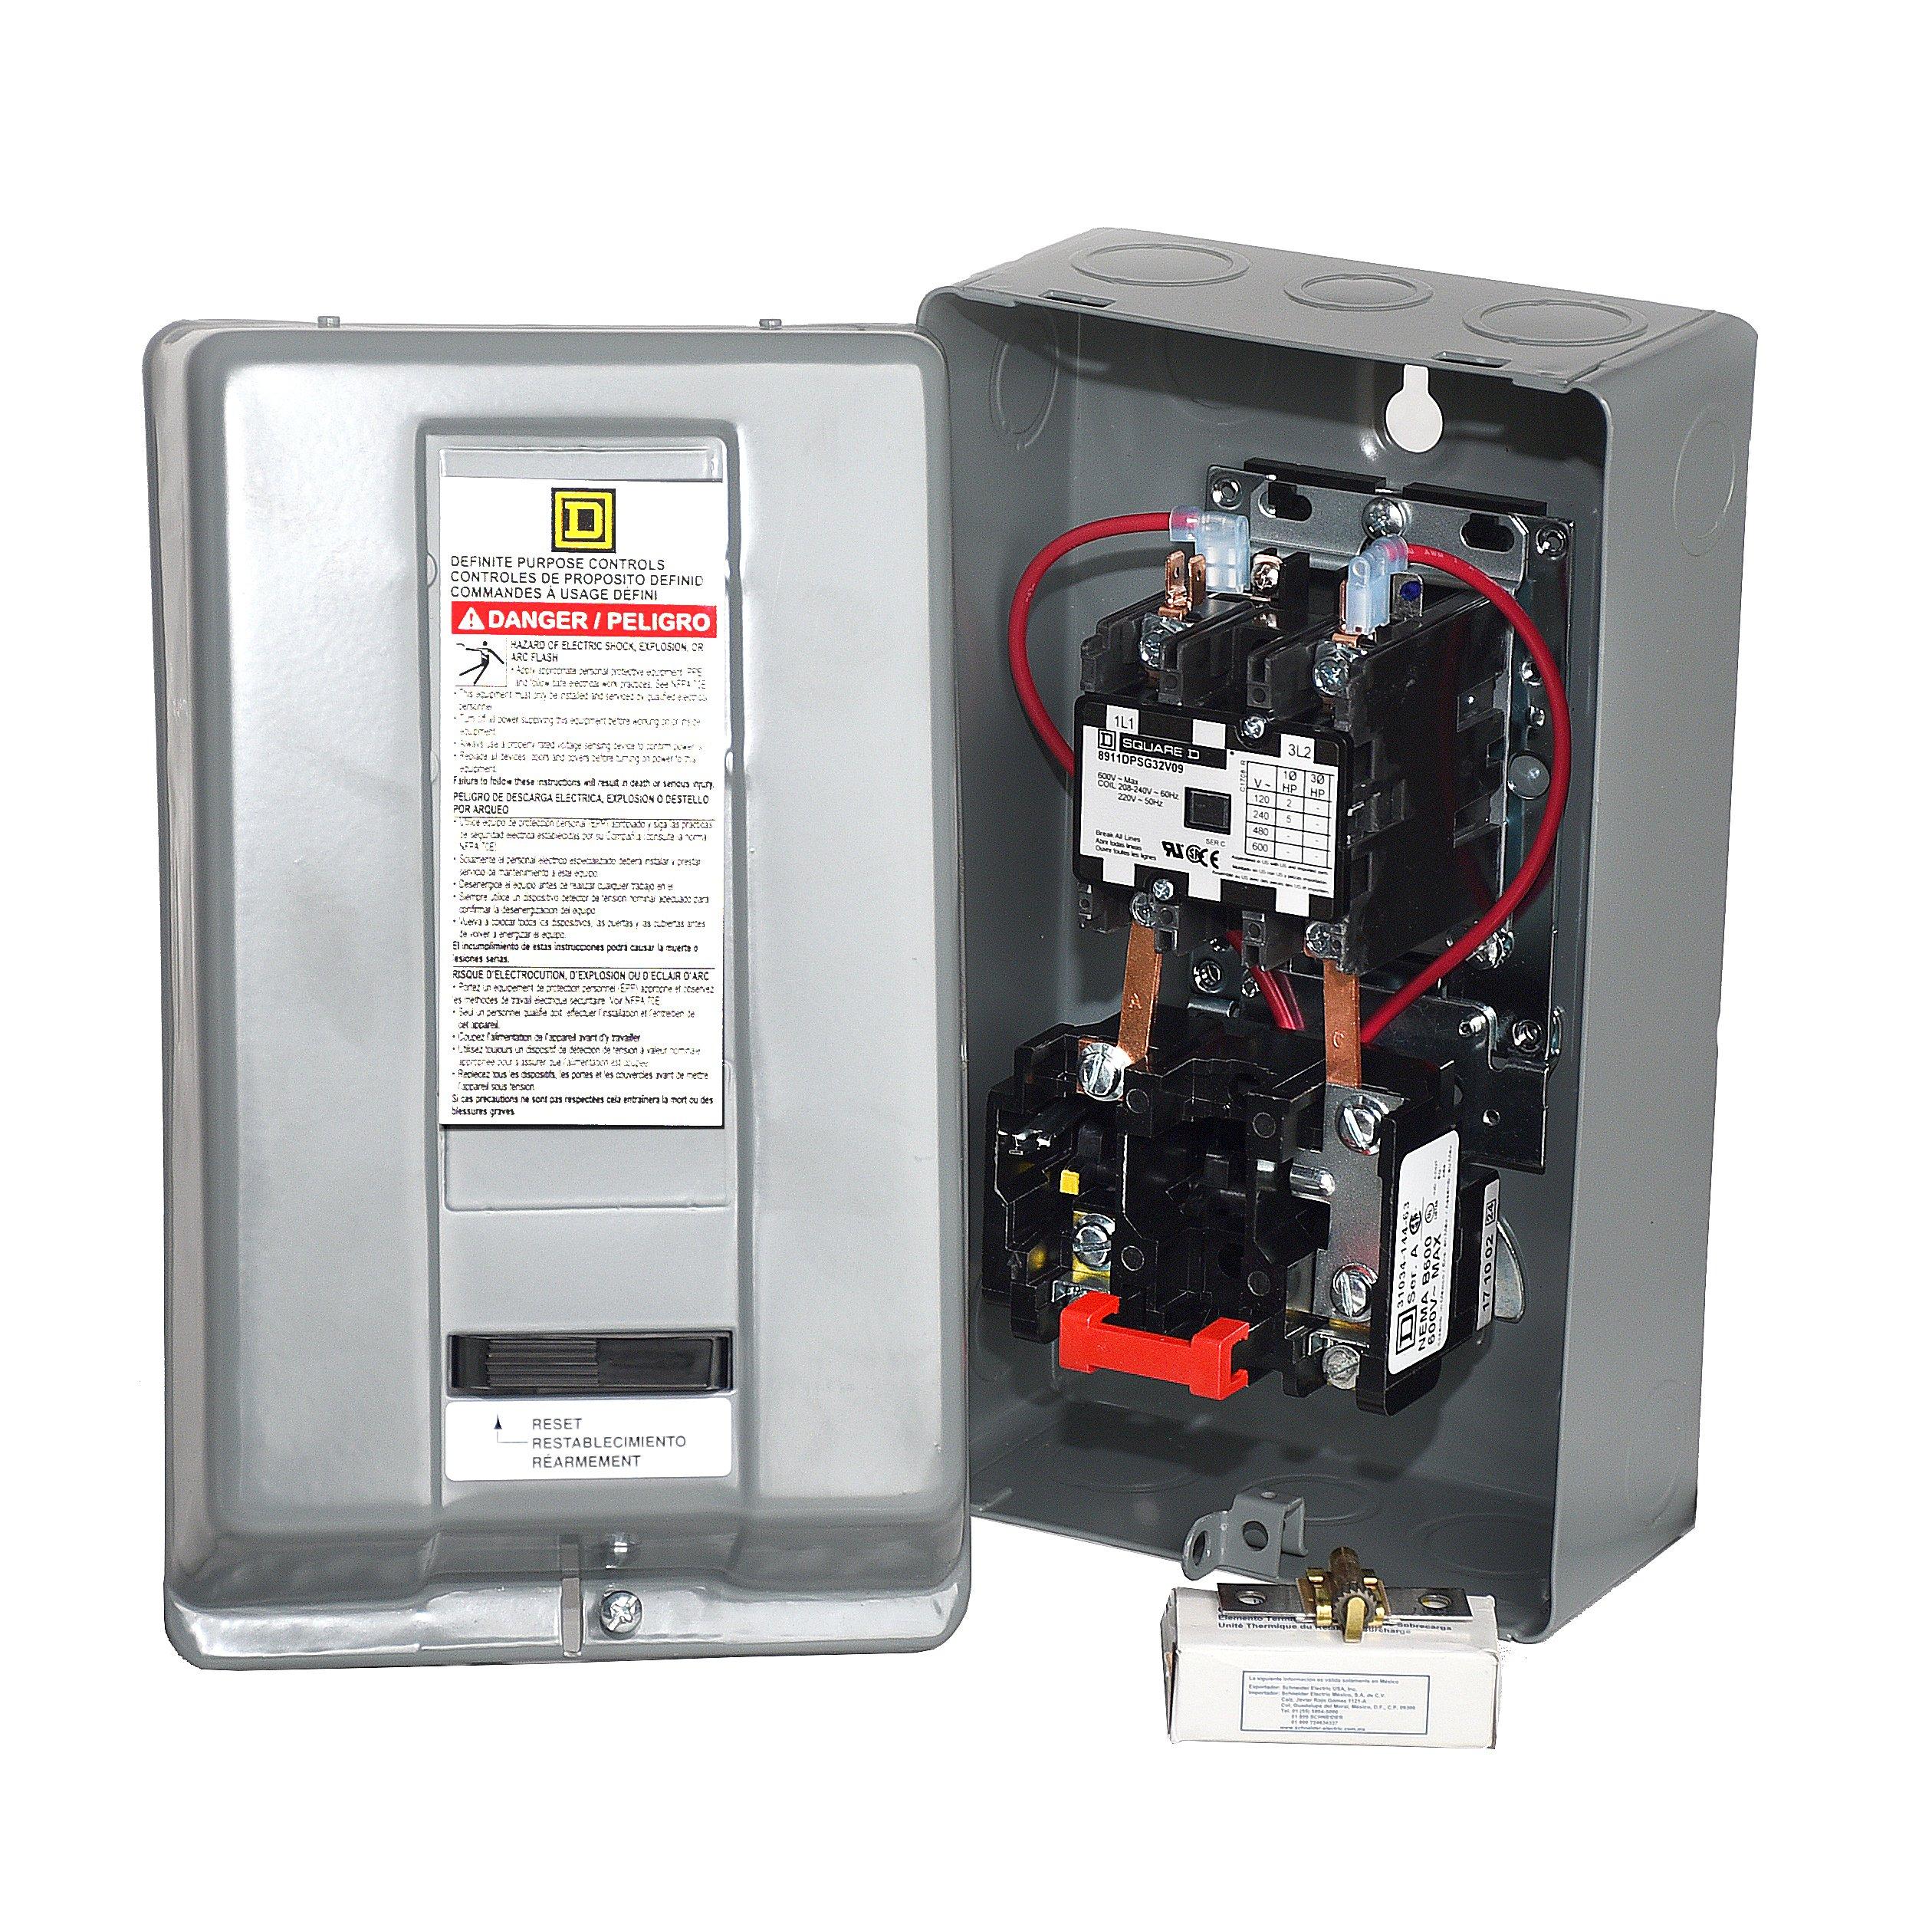 SQUARE D MAGNETIC STARTER CONRTROL ELECTRIC MOTOR 8911DPSG42V09 7.5HP 1-PH 230V by I.E.E (Image #2)